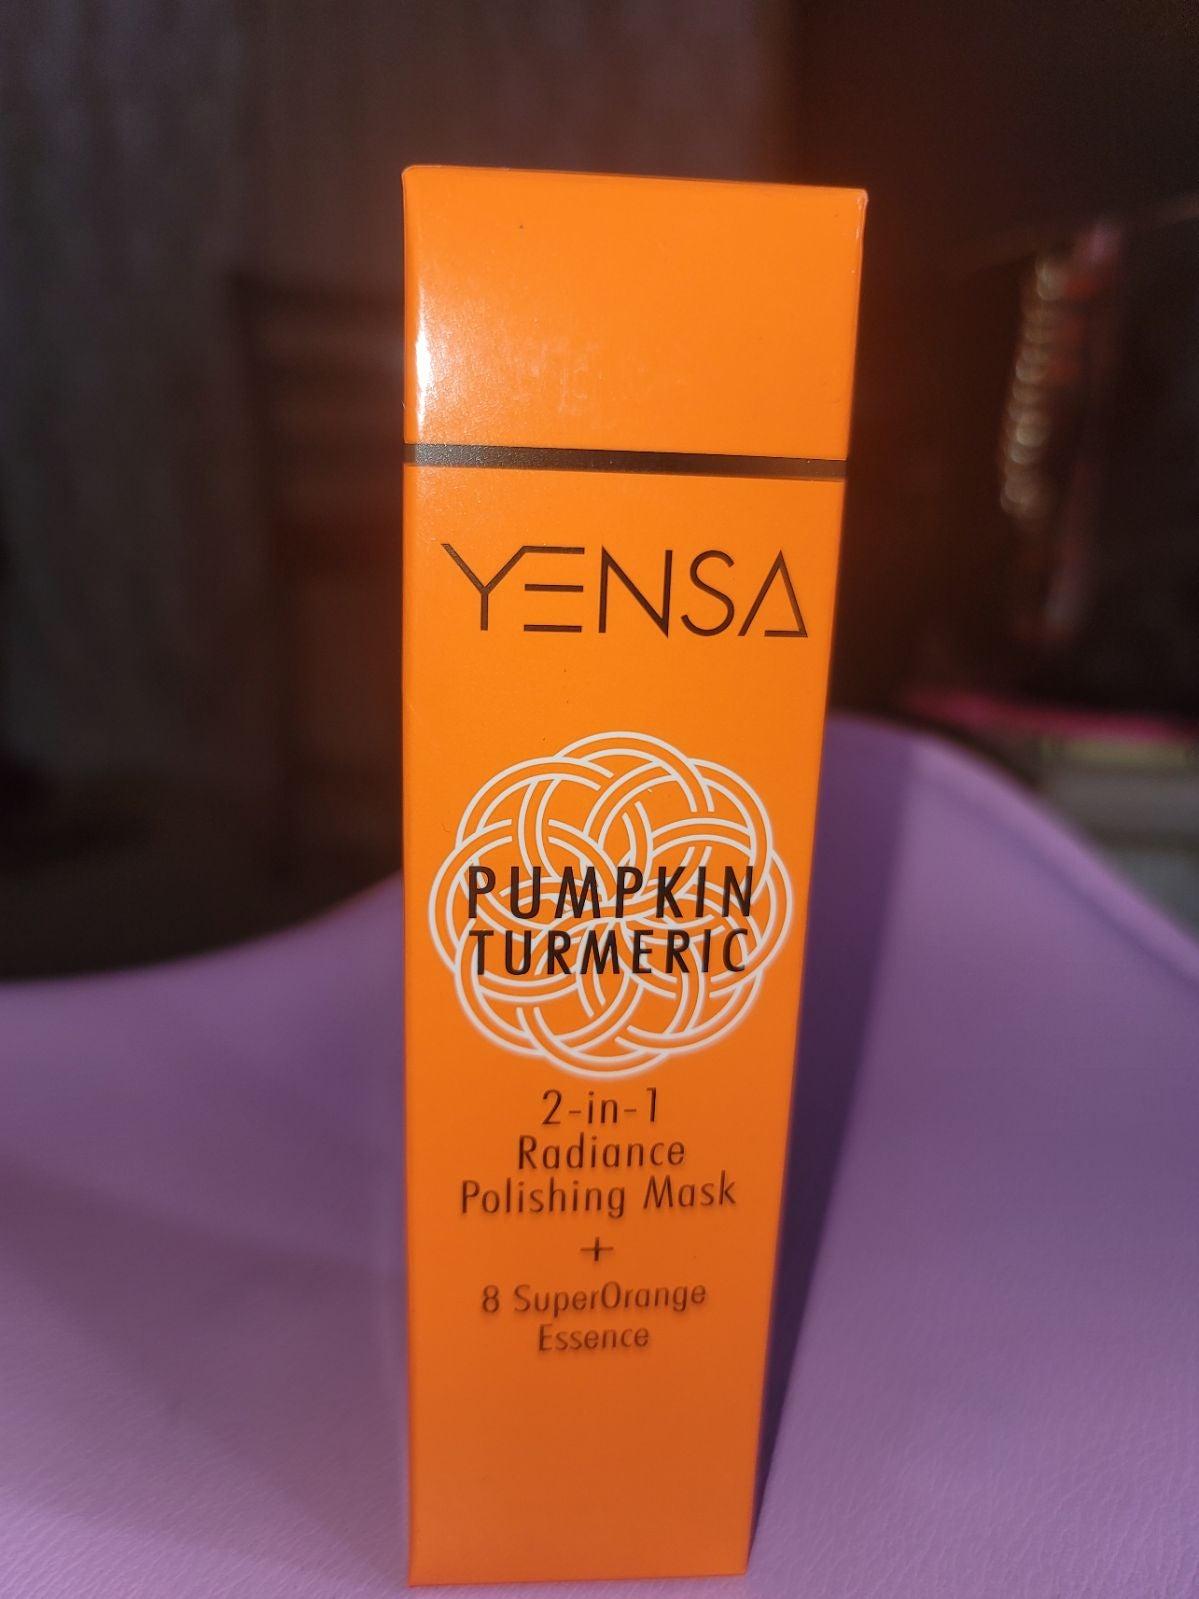 Yensa Pumpkin Turmeric Mask